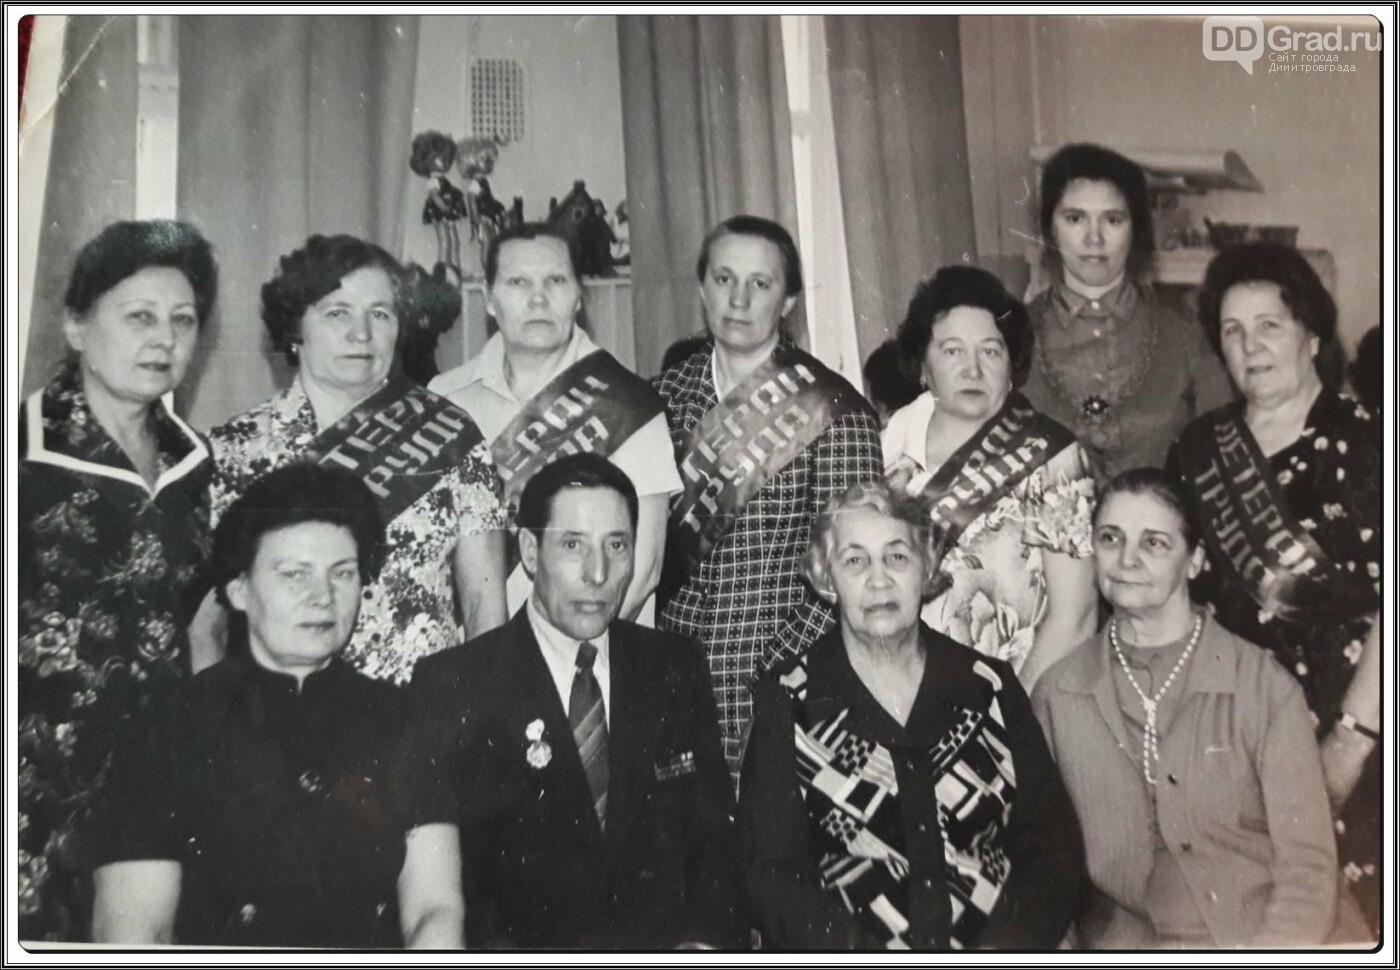 память через время димитровградка   Саванеева (Сидарочева)Ефросинья Григорьевна, фото-8